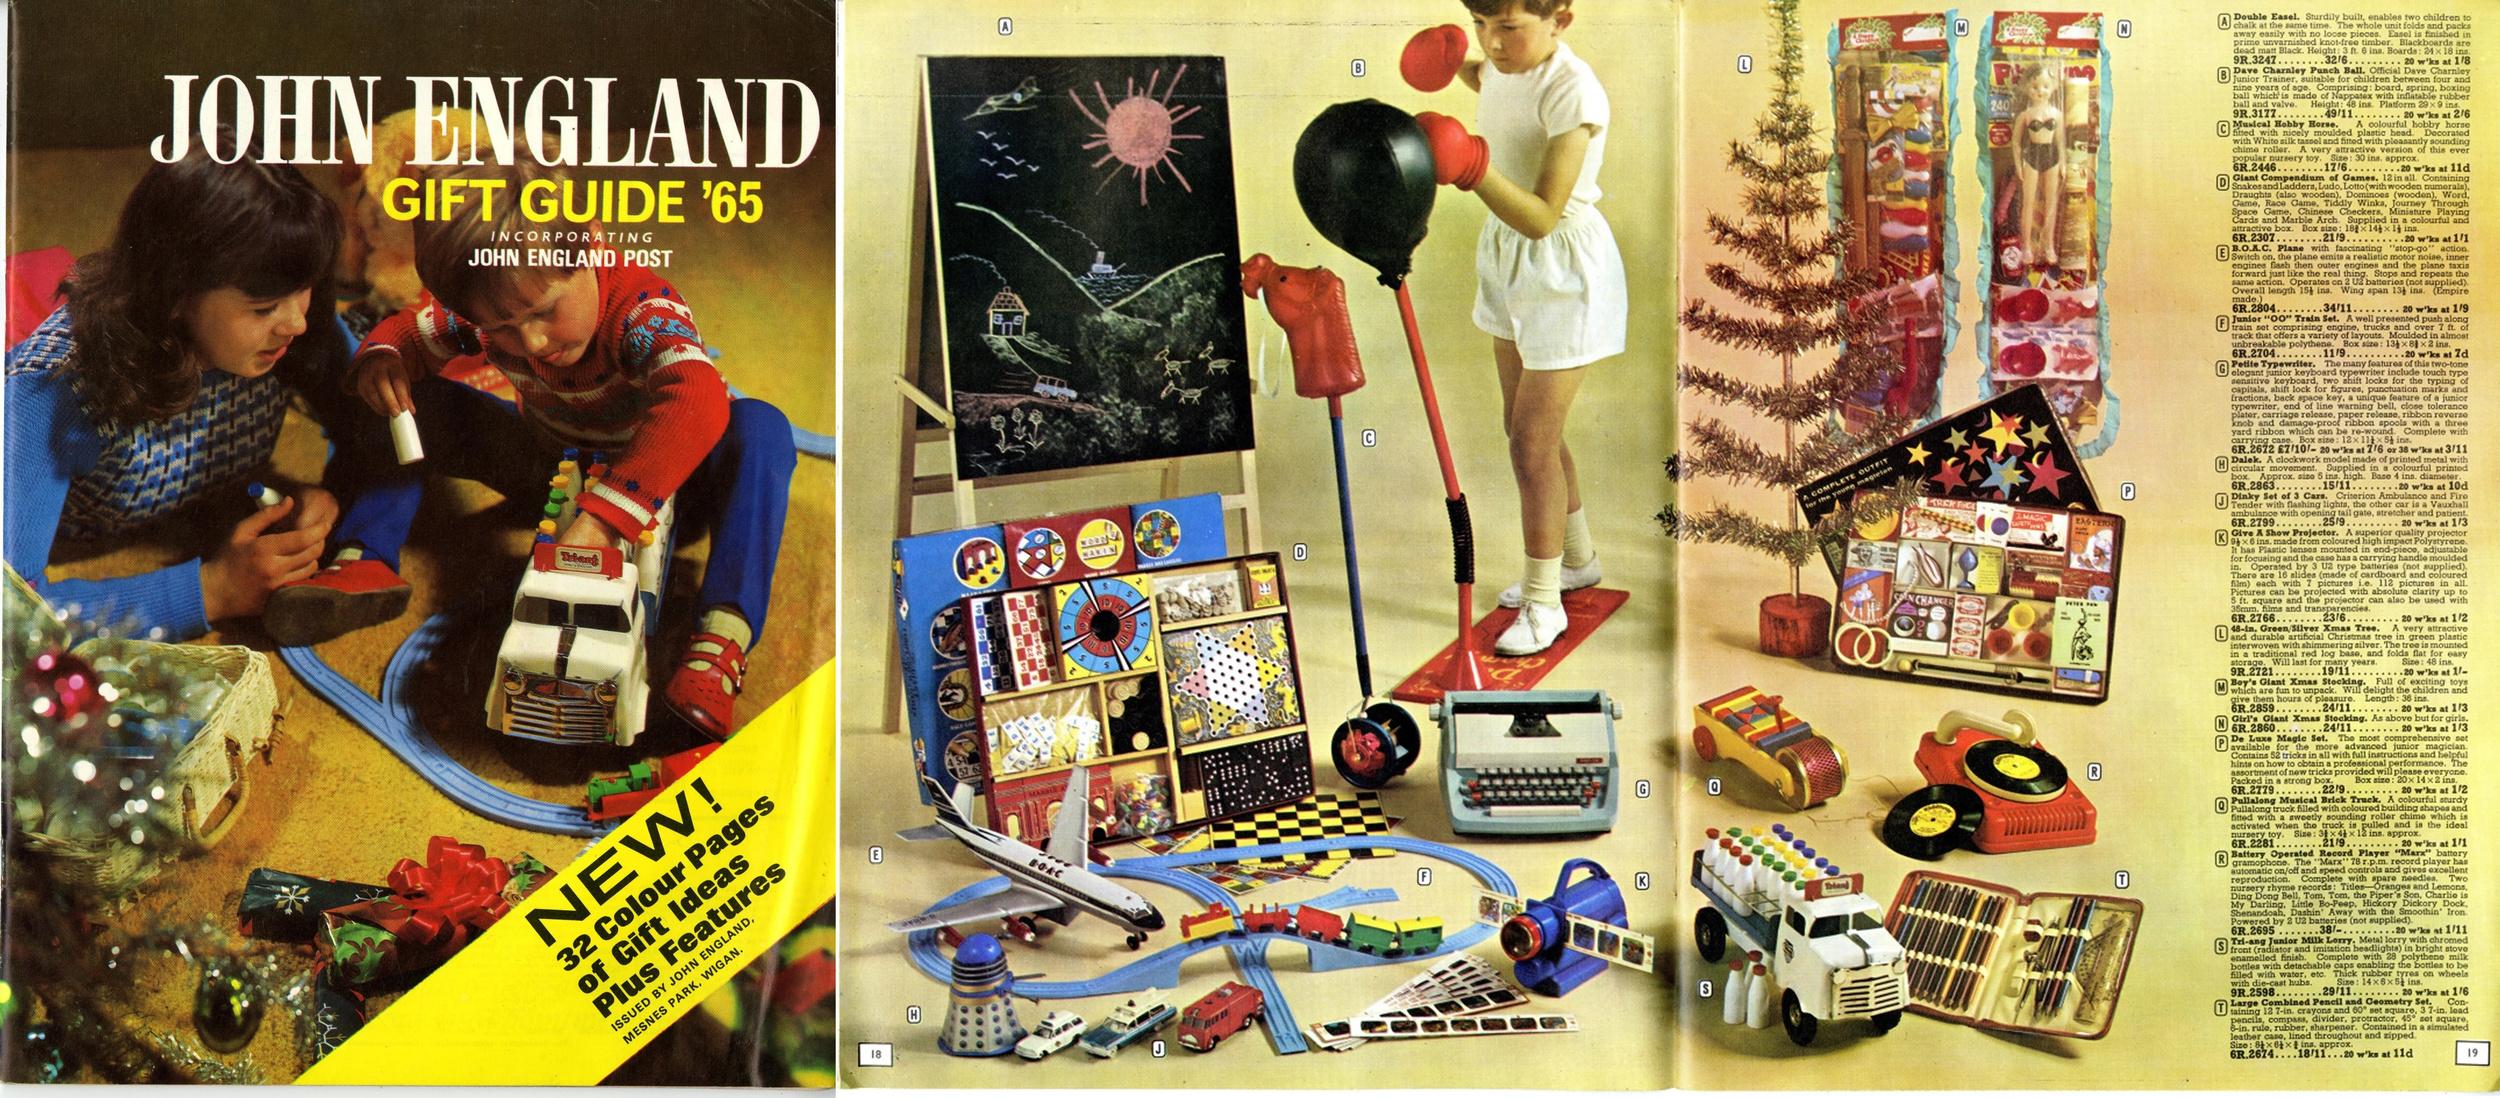 John England Gift Guide '65 showing Codeg mechanical Dalek